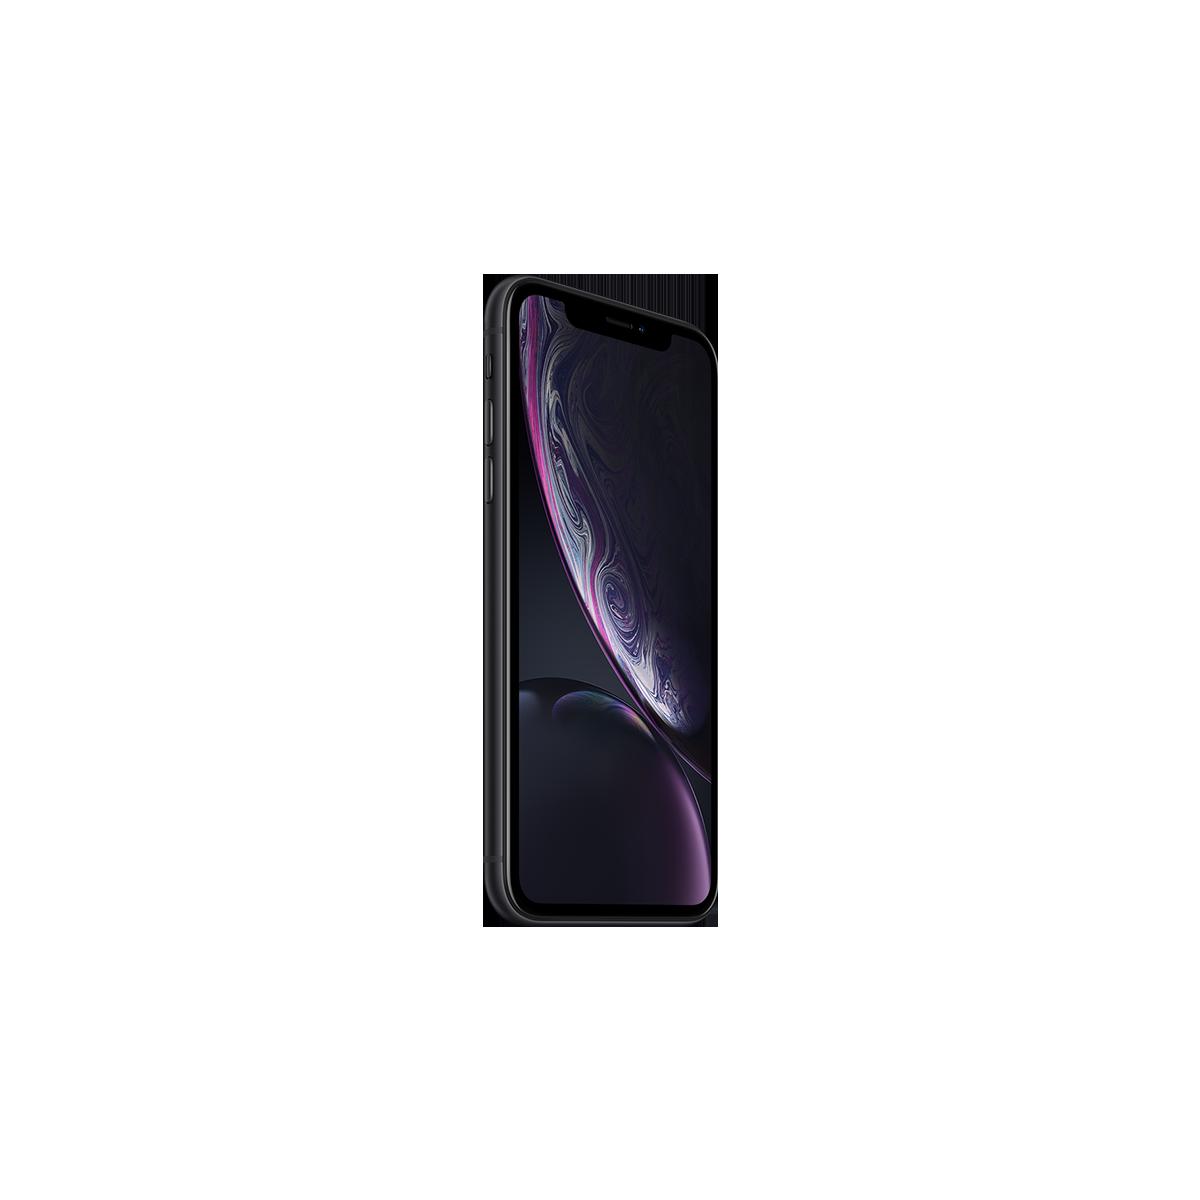 Apple iPhone XR Dual Sim 64 Гб (Черный) 12 месяцев гарантия